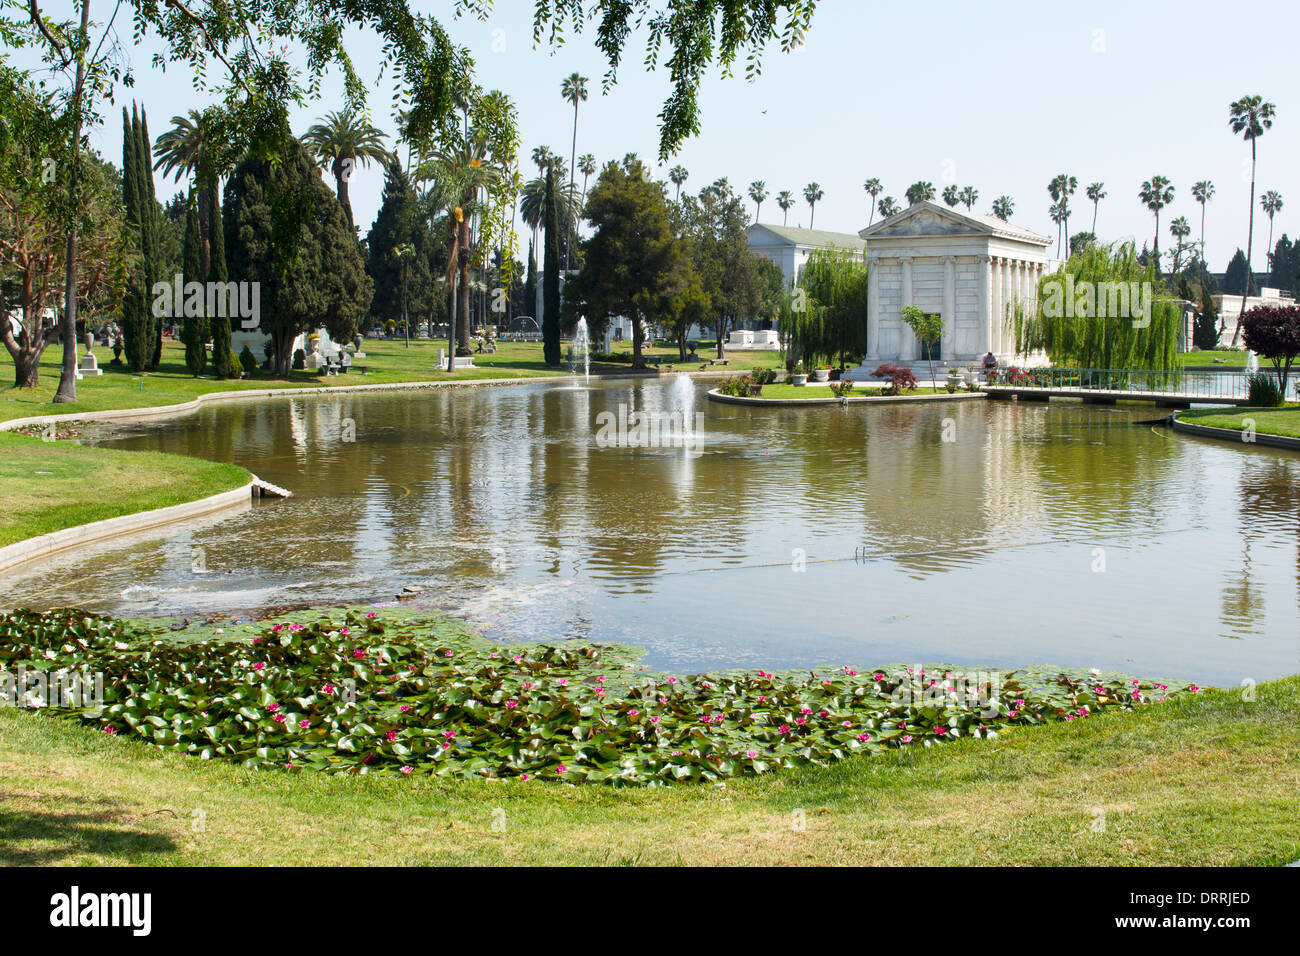 Das Insel-Mausoleum von William Clark Jr. in den Hollywood Forever Cemetery Hollywood Los Angeles USA Stockbild